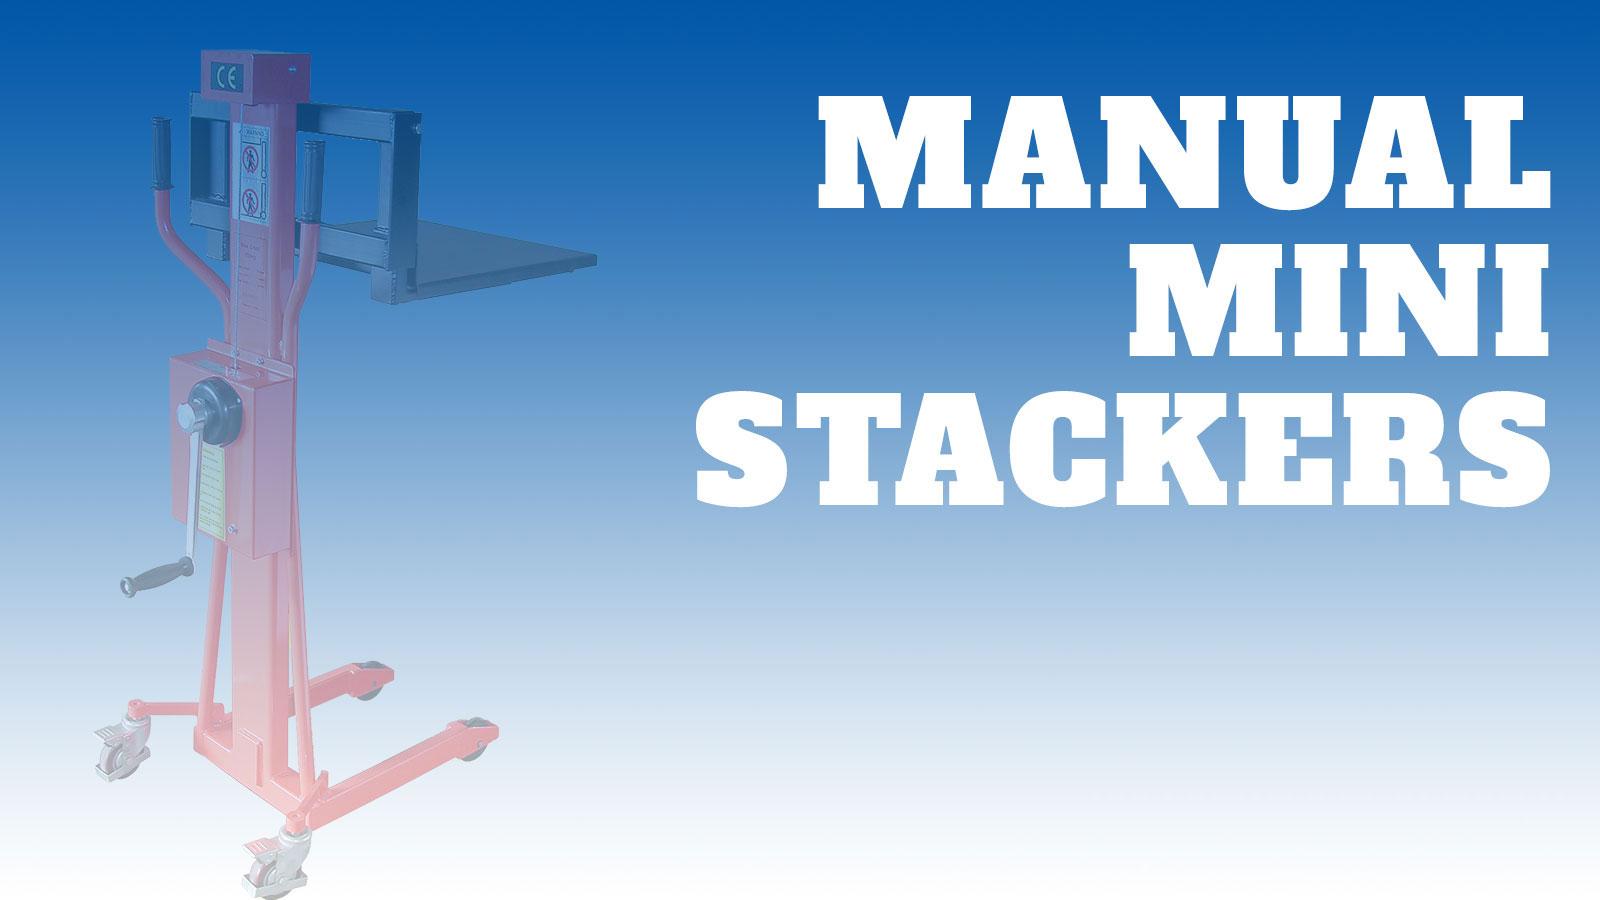 Lifting-Manual-Mini-Stackers